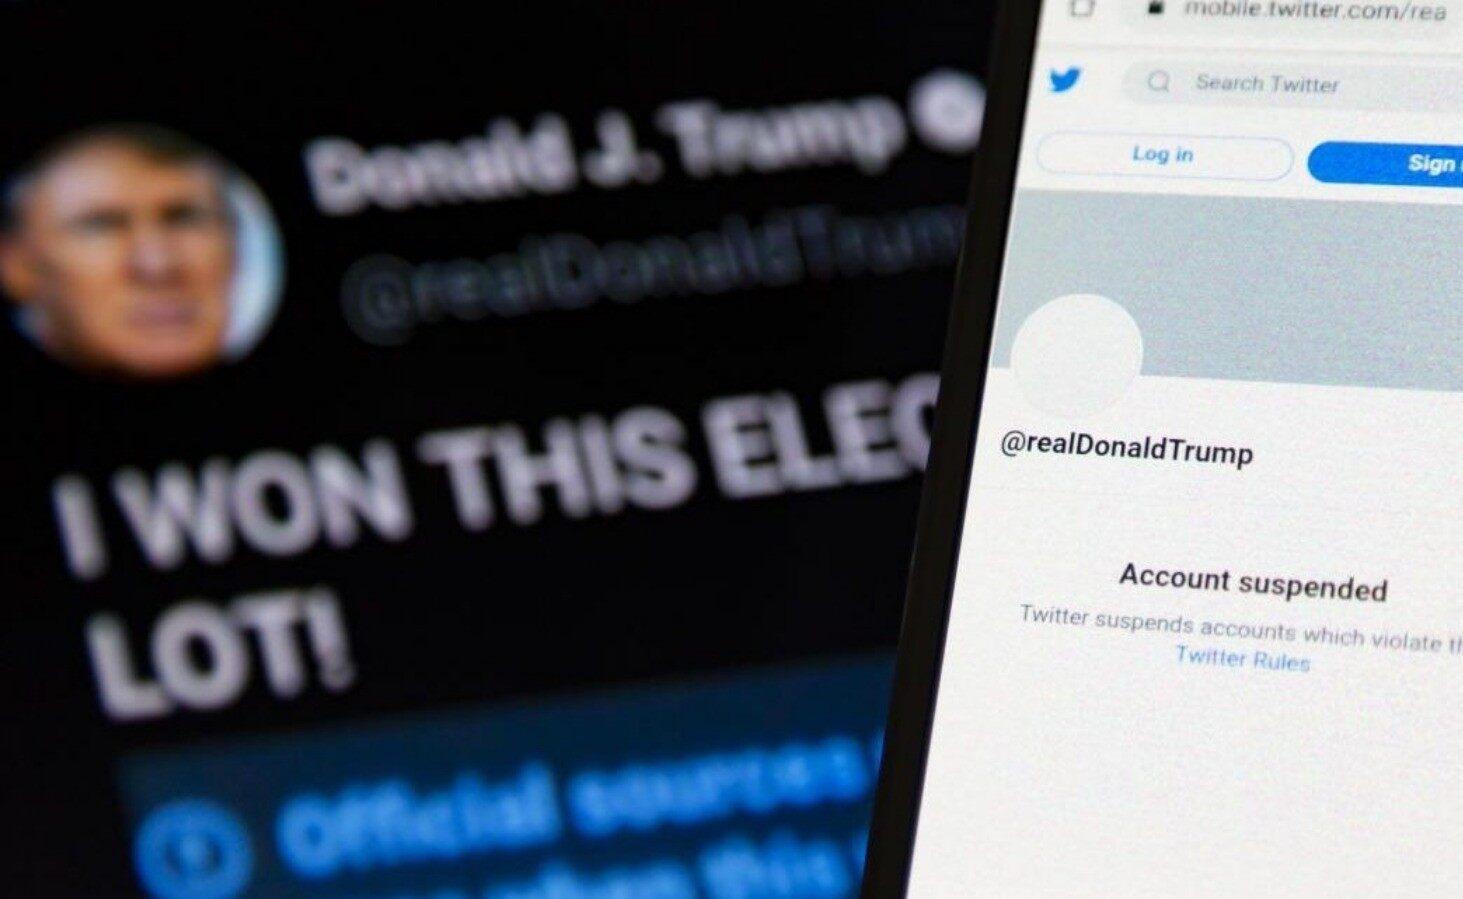 Twitter Stock Drops 10% After Trump Ban